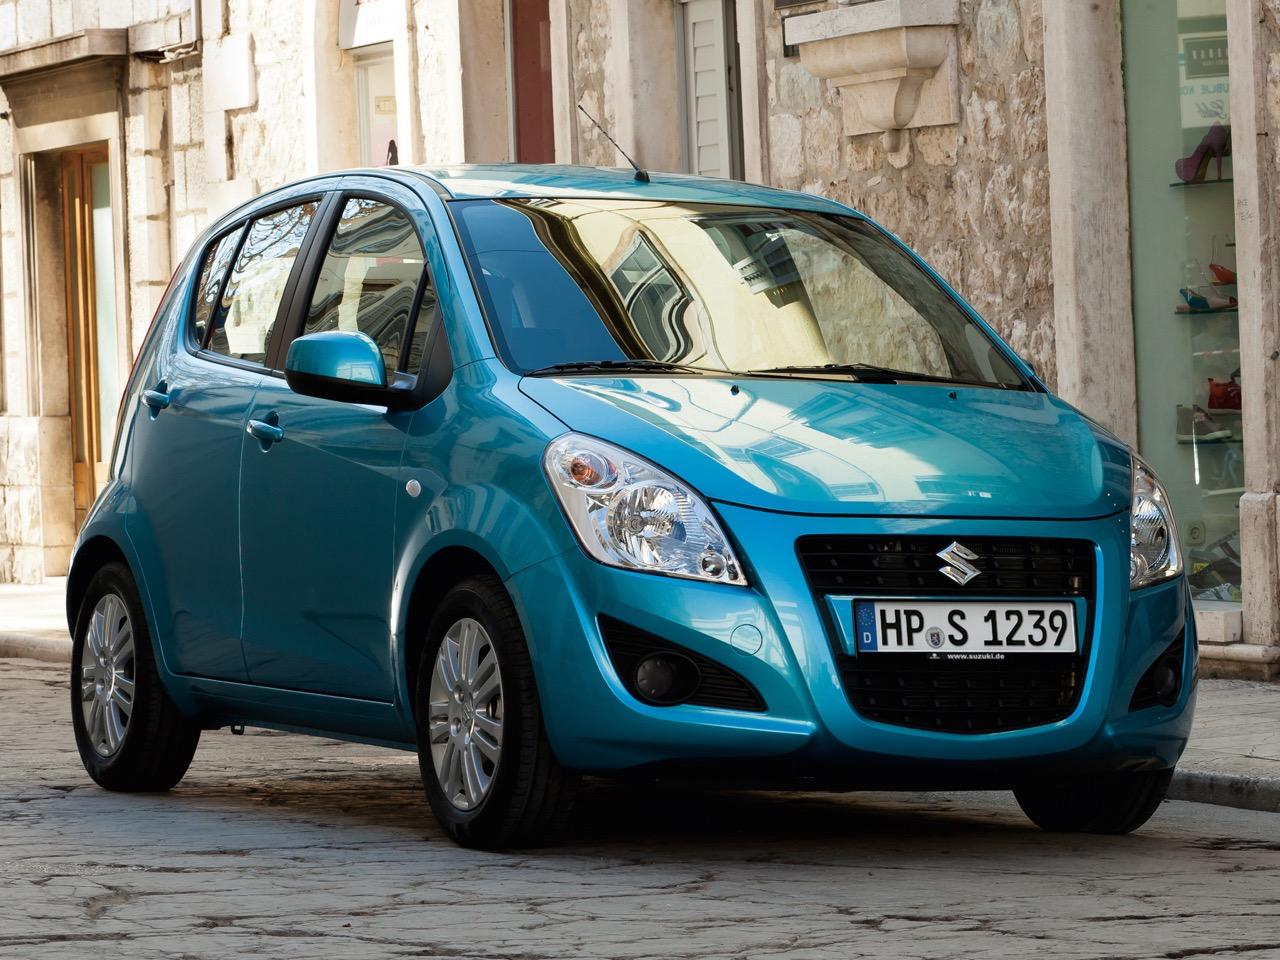 Suzuki Splash 2012 – 1